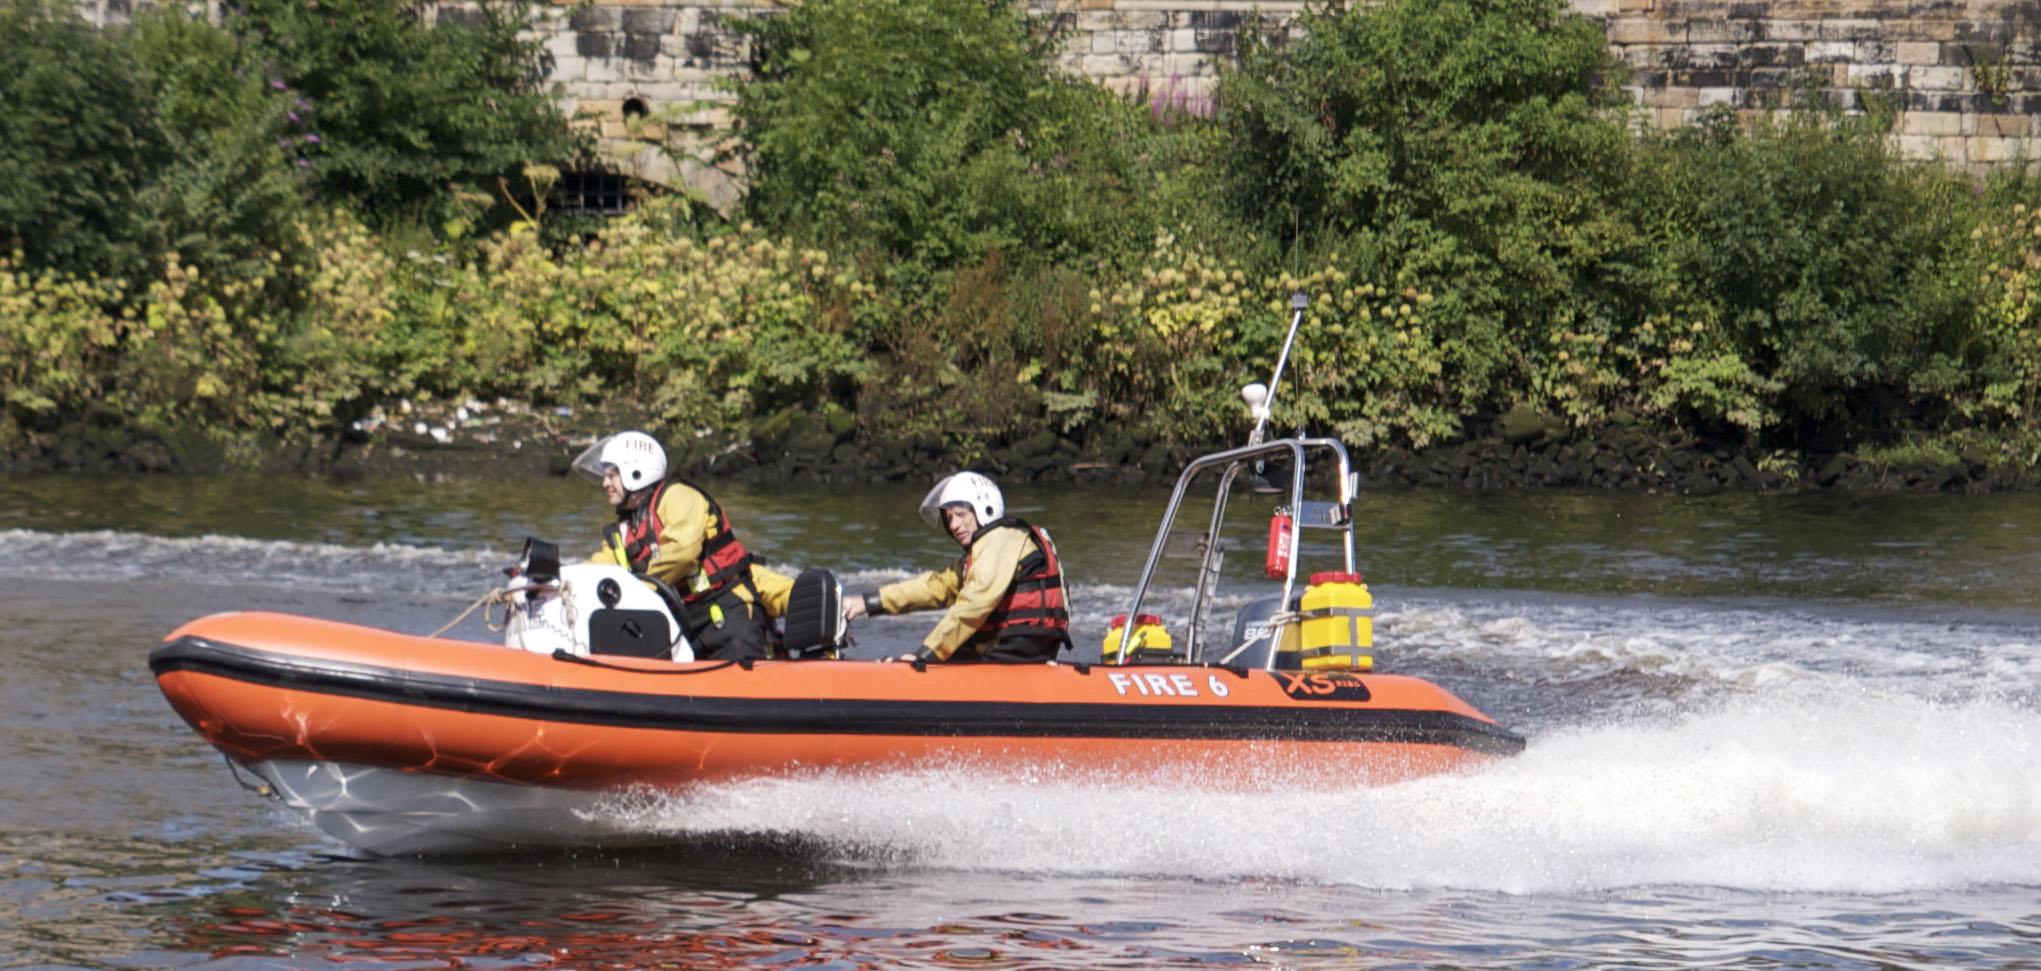 Water rescue in Argyll